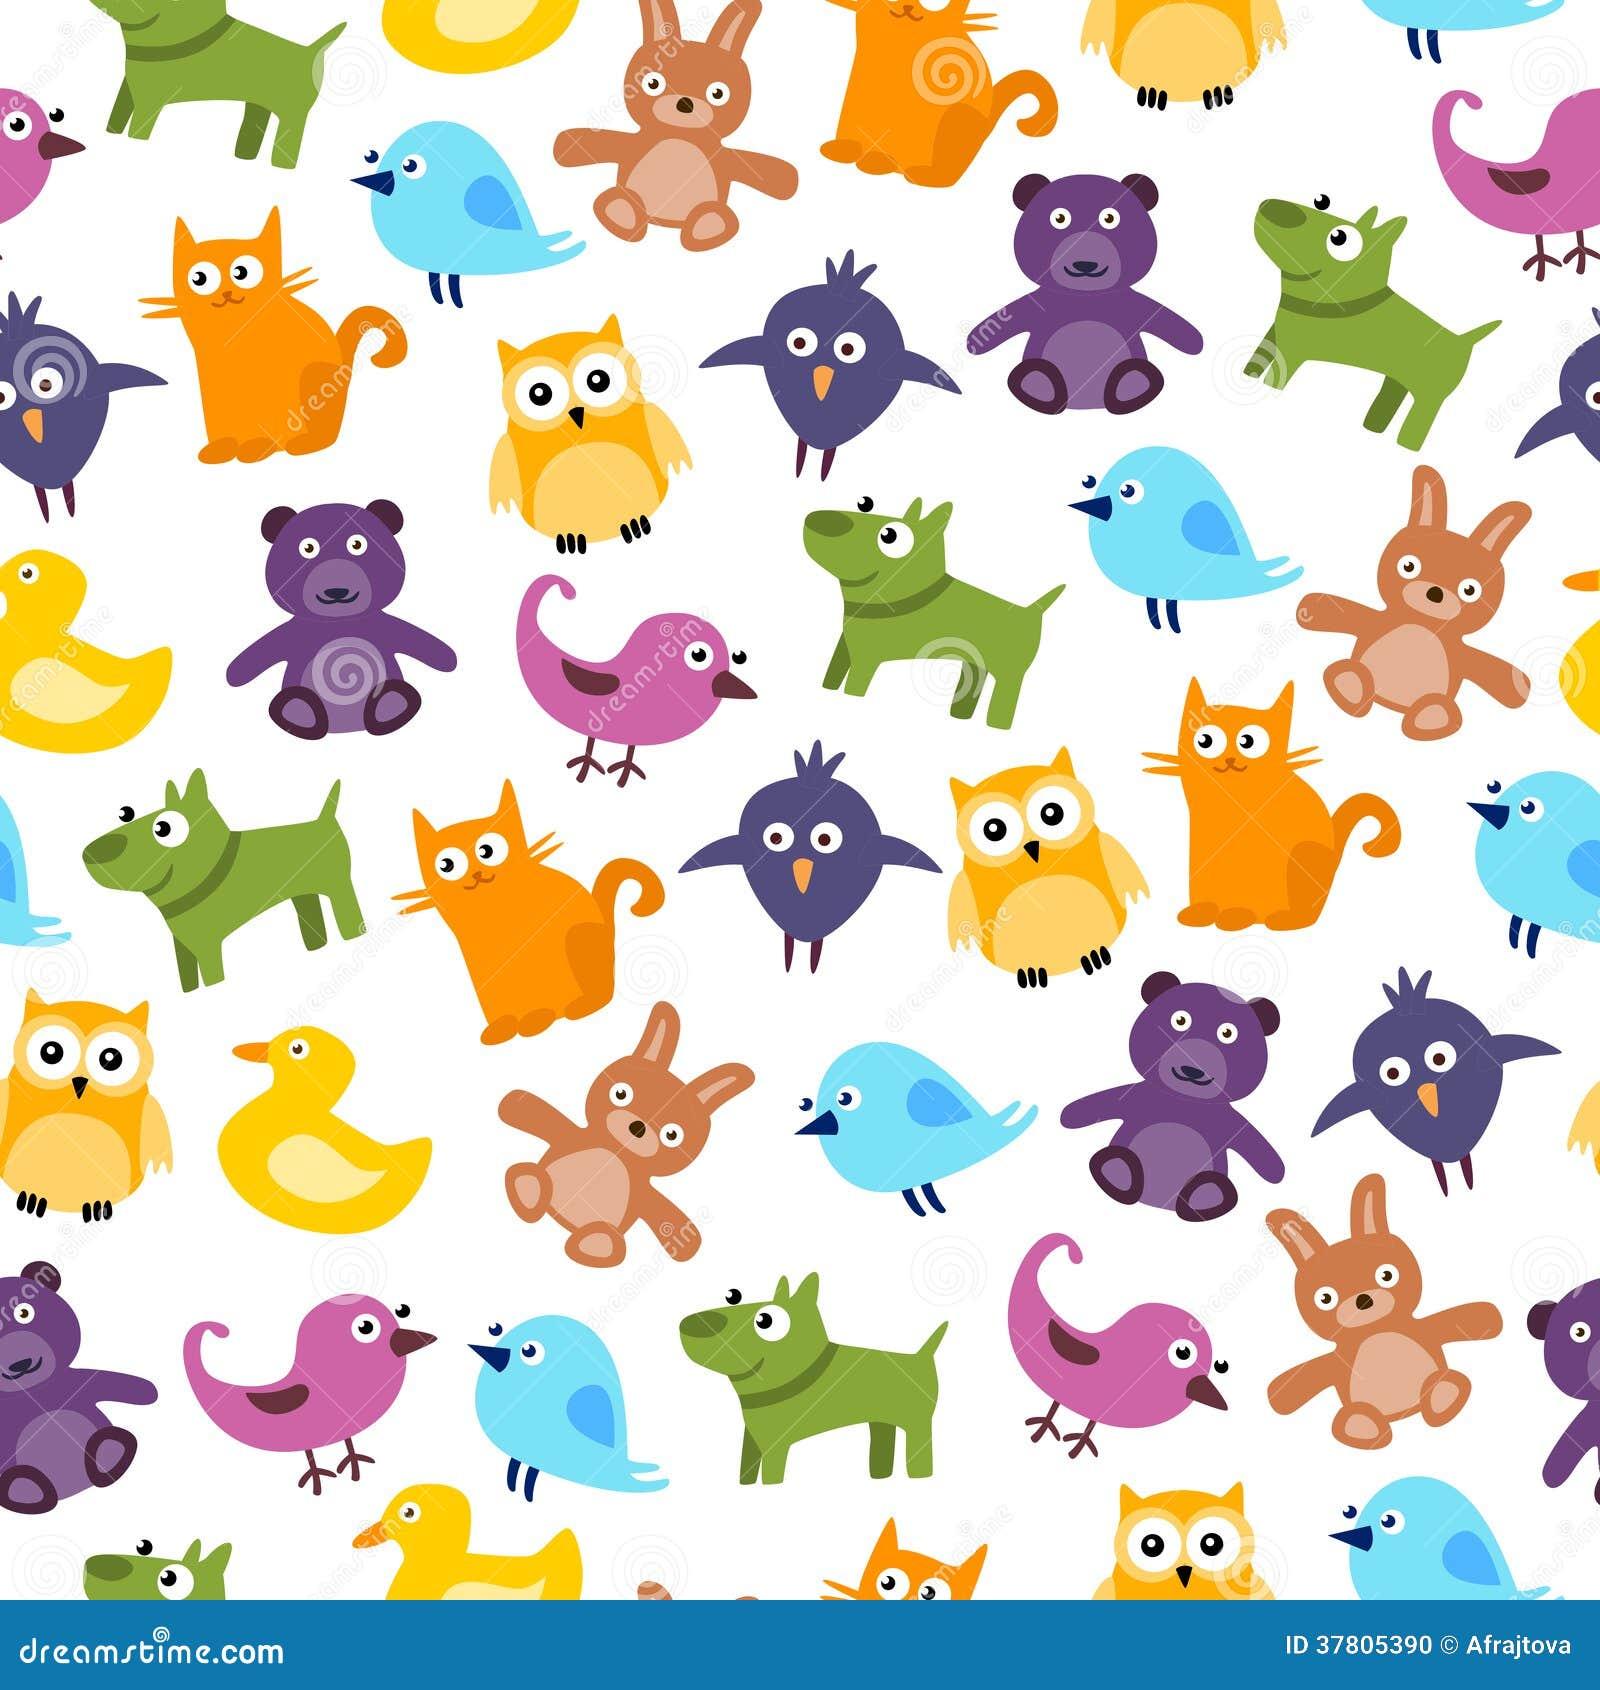 cute kids pattern - Kids Cartoon Animals